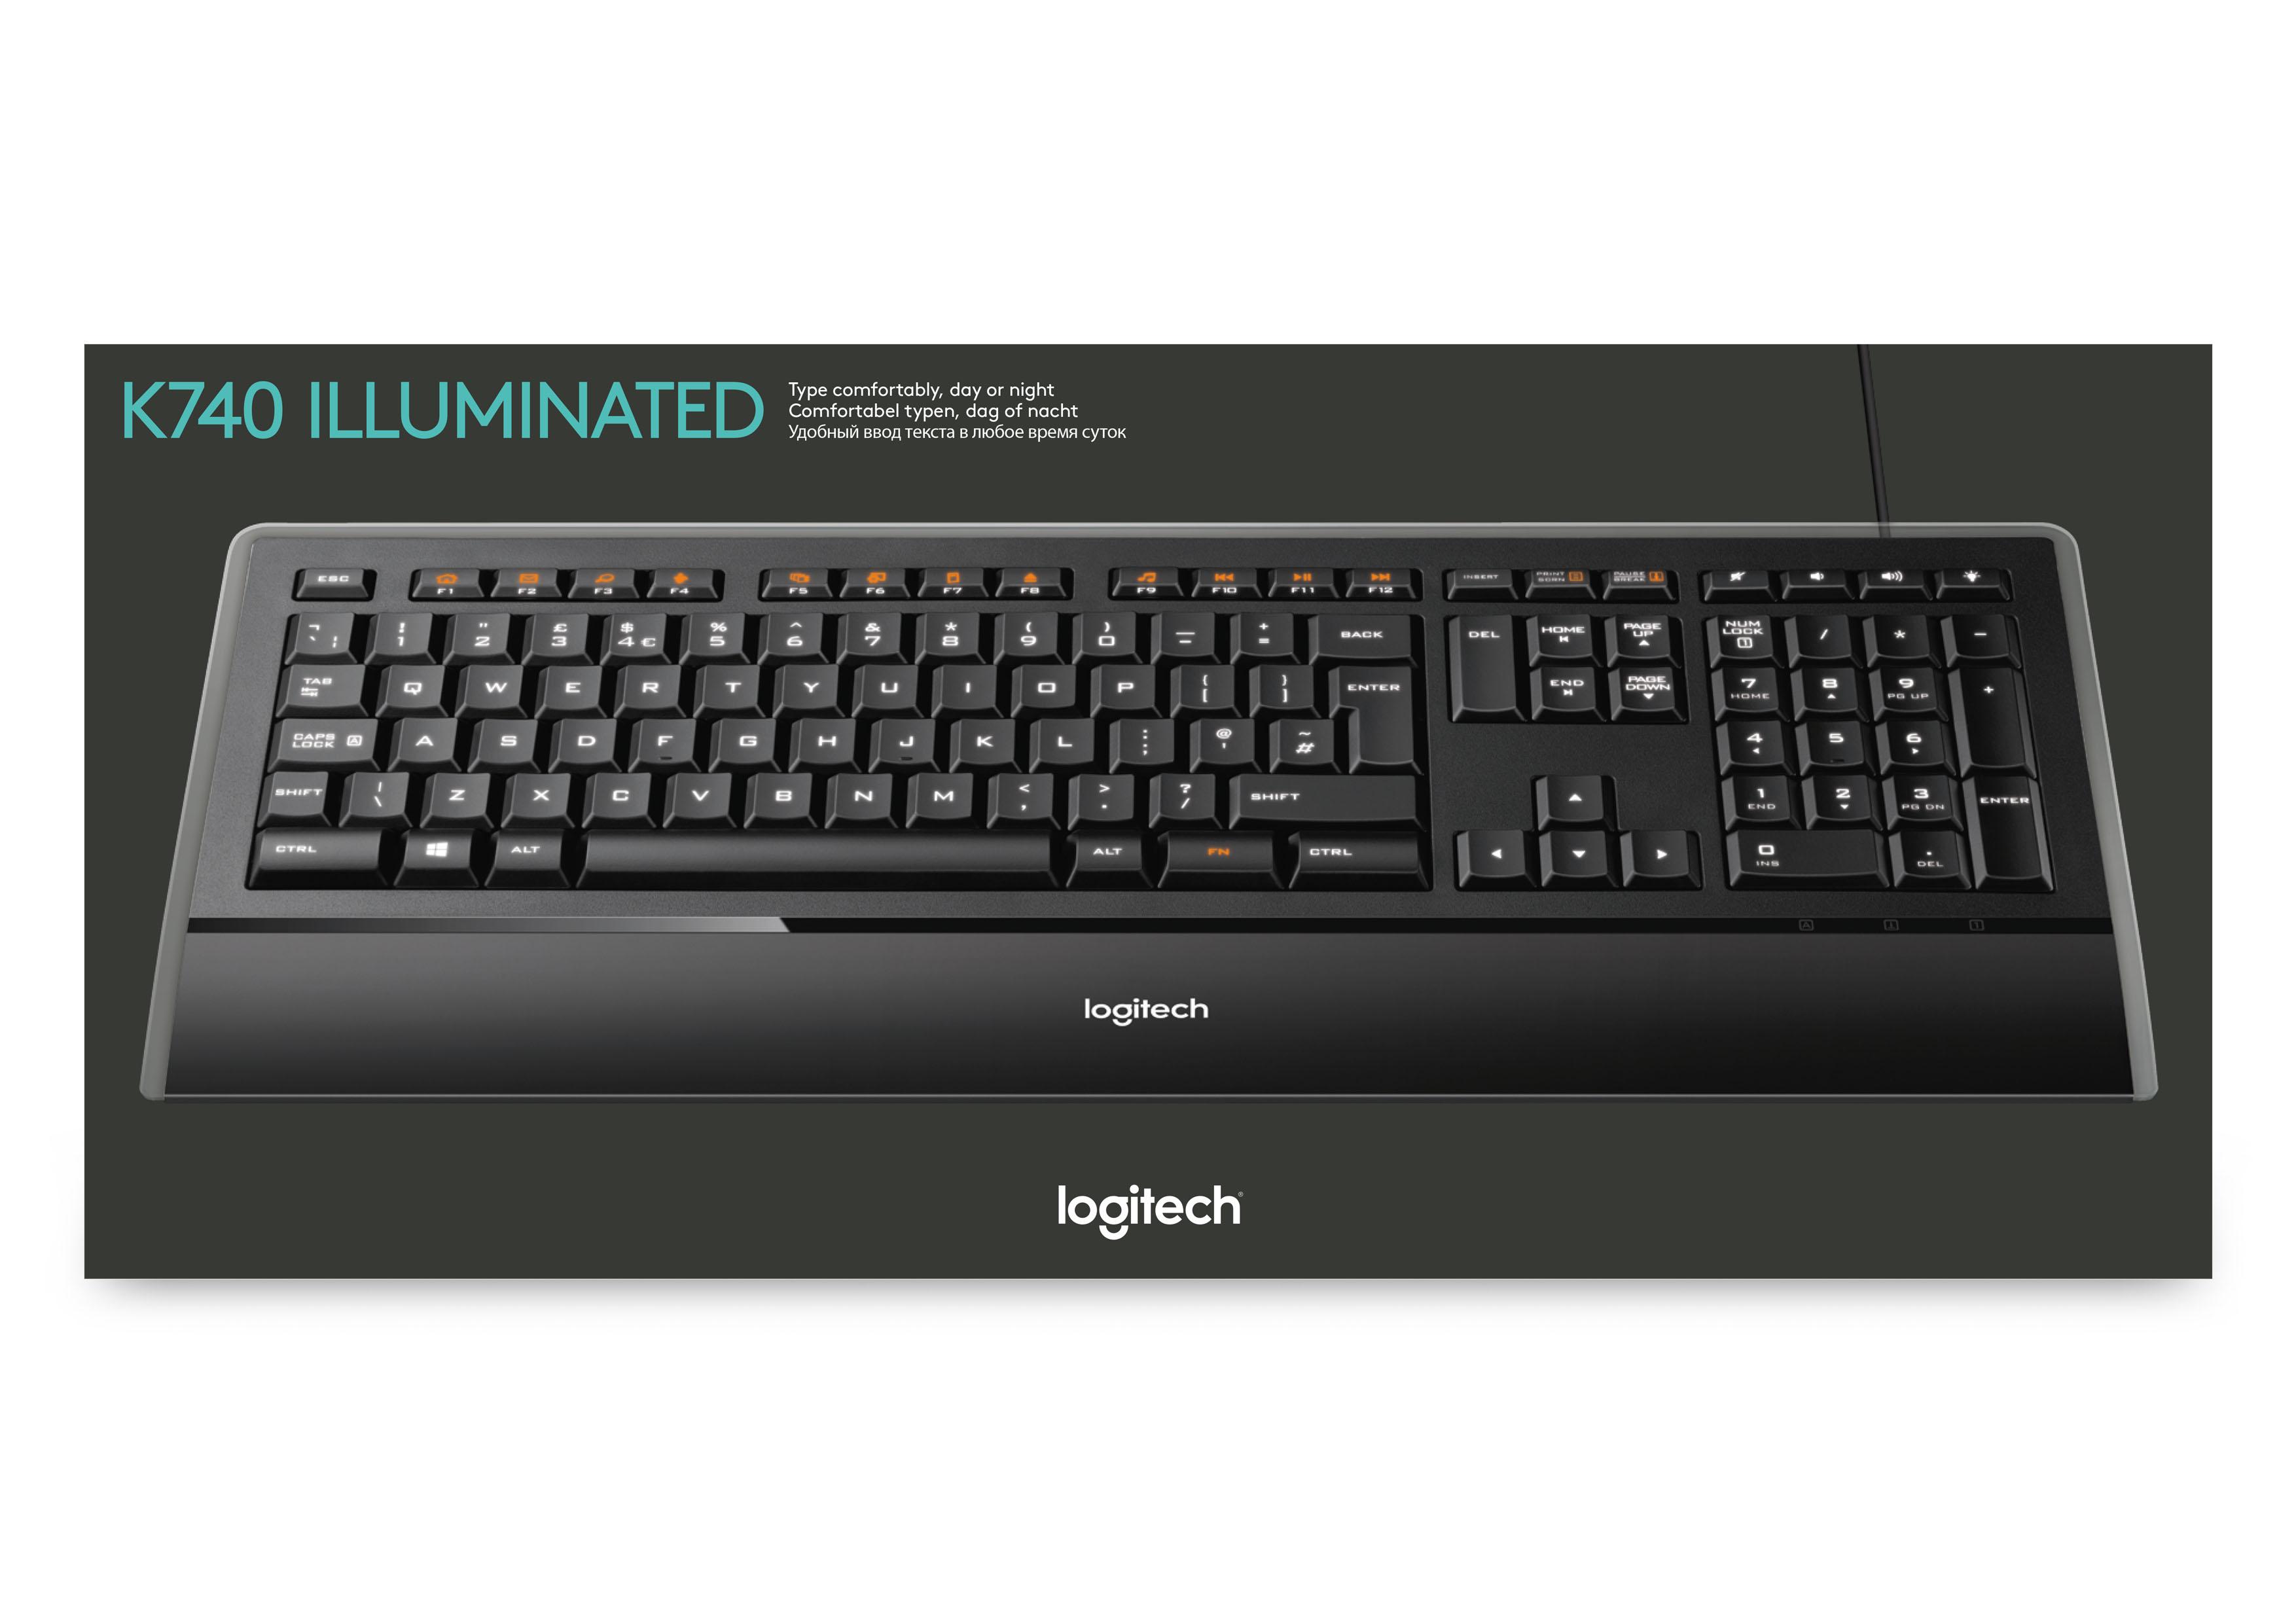 Logitech Illuminated K740 Tastatur Usb Deutsch Amazon De Computer Zubehor